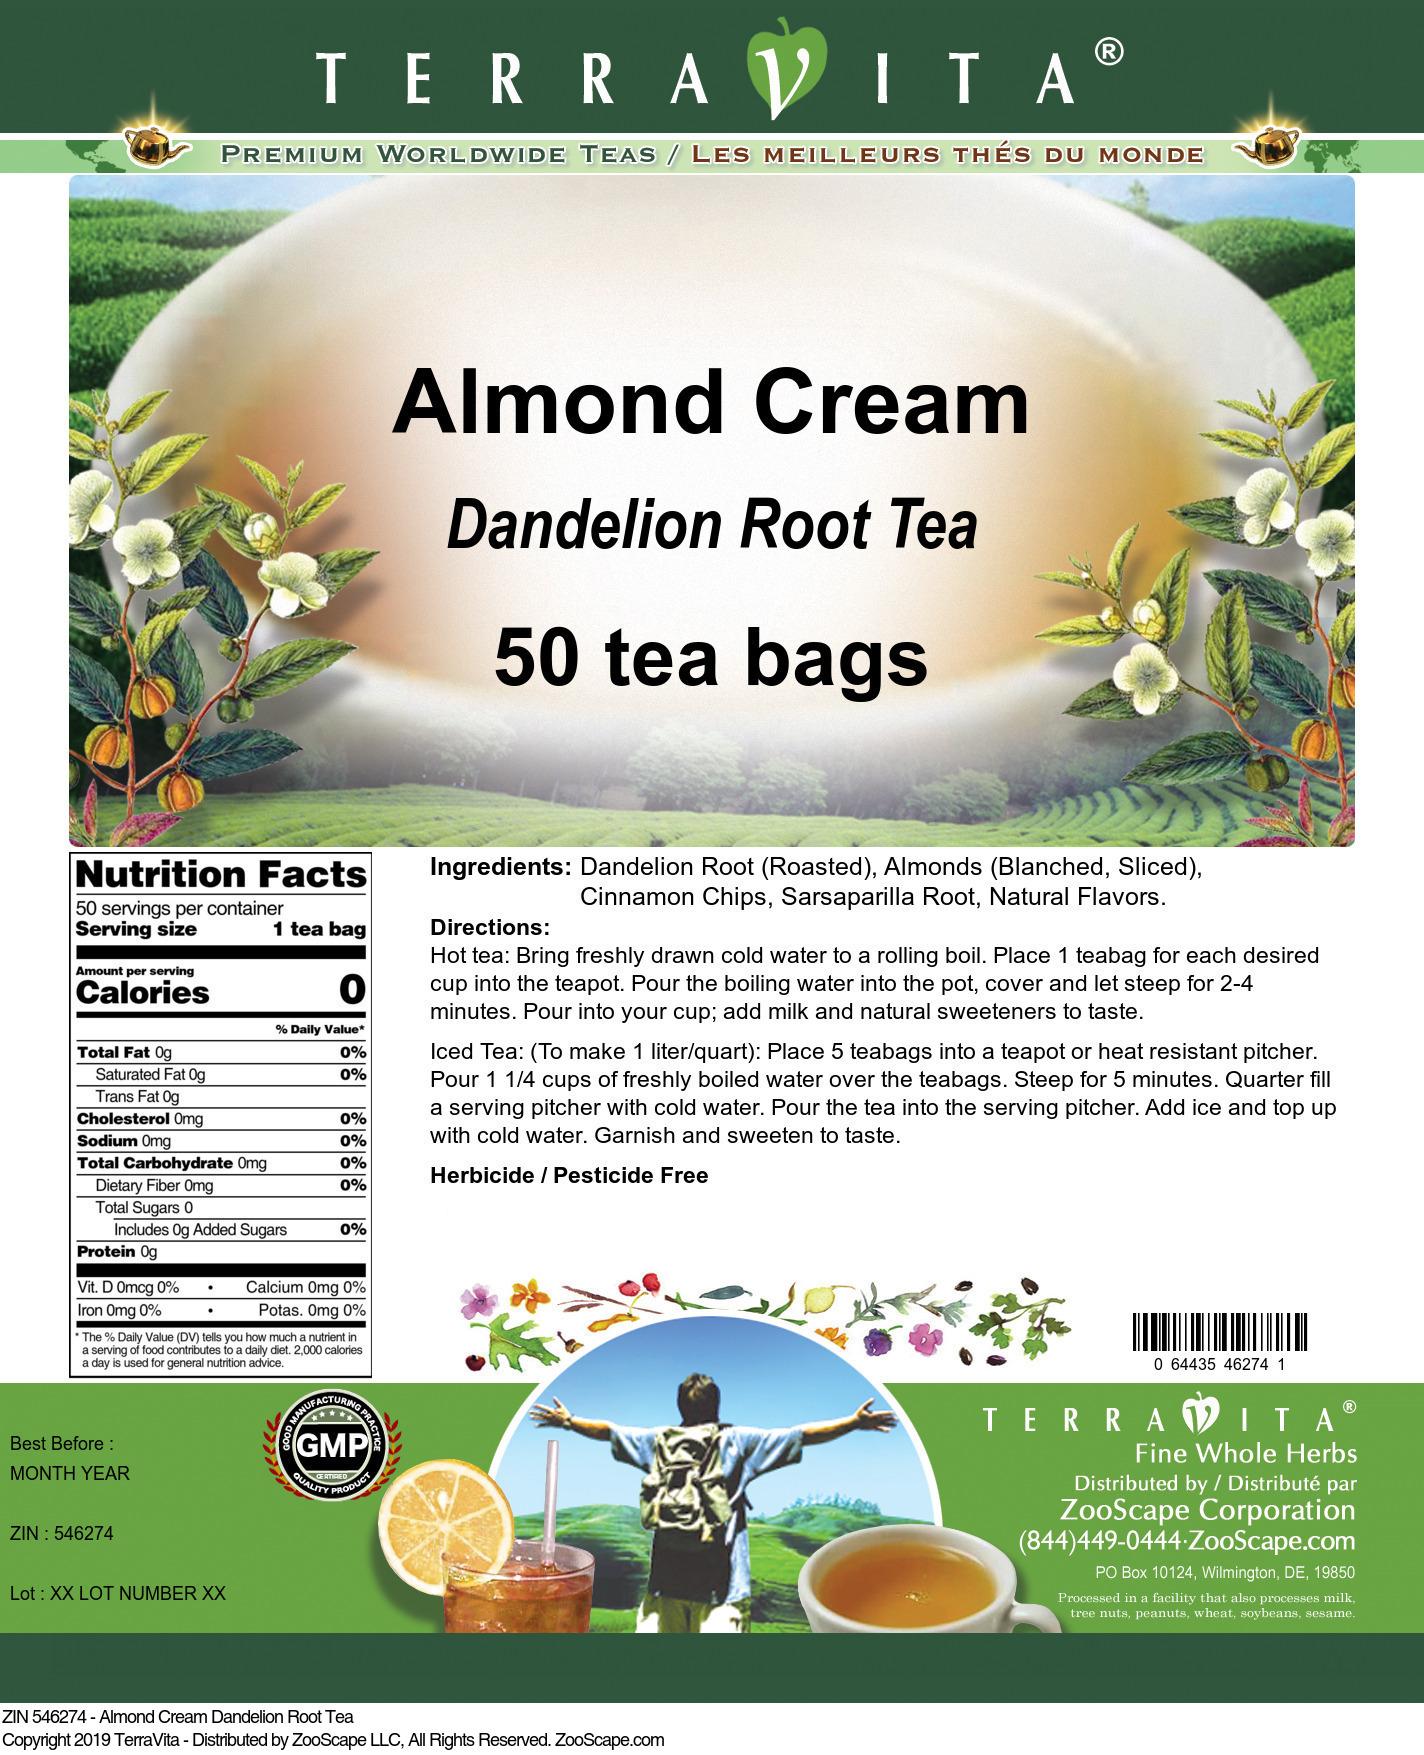 Almond Cream Dandelion Root